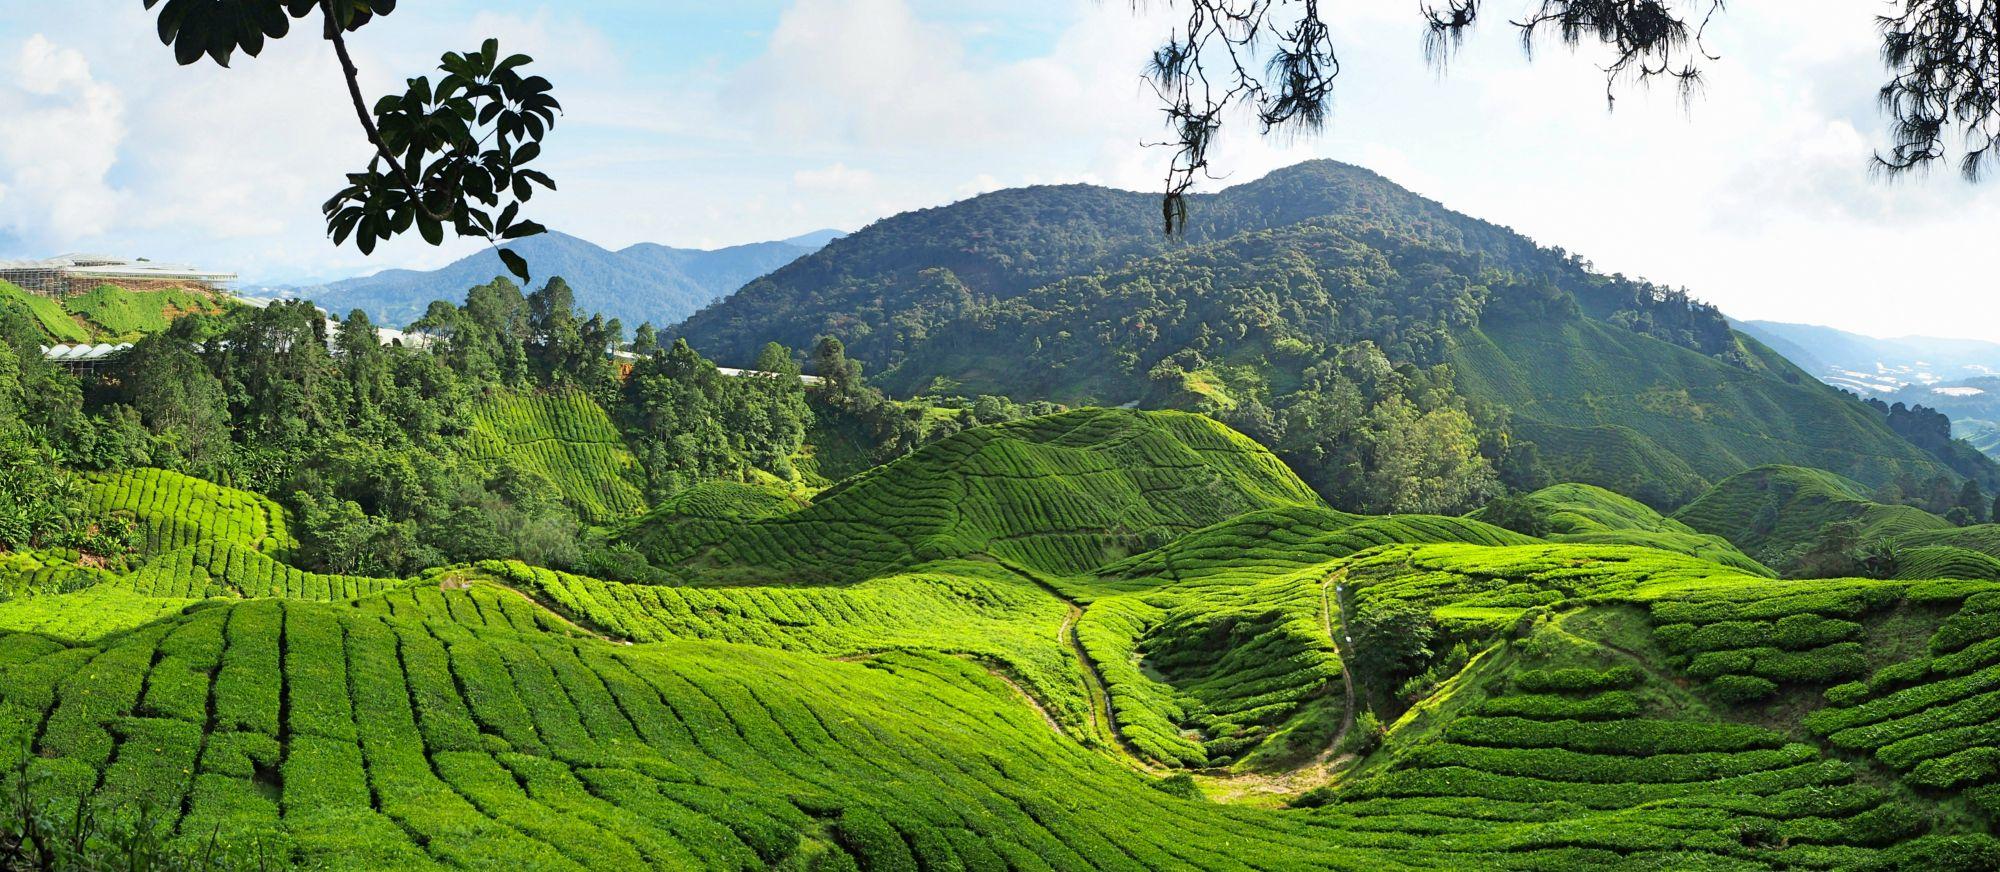 Maleisie Cameron Highlands heuvelachtige thee plantages